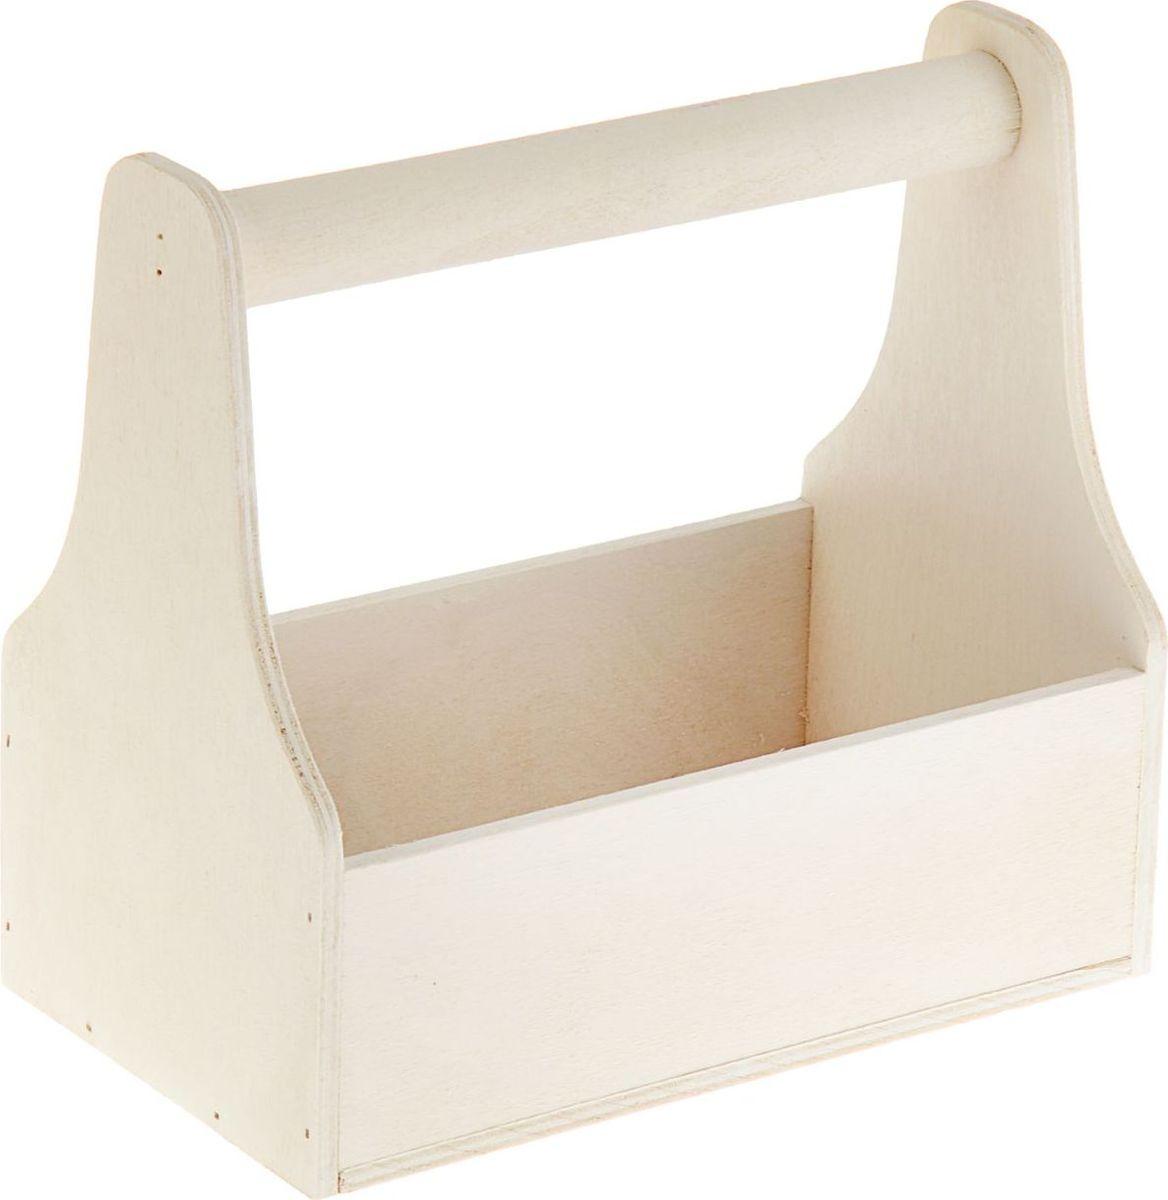 Кашпо ТД ДМ Ящик для инструментов, цвет: белый, 20 х 20 х 12,5 см кашпо тд дм ящик любовь флористическое 20 х 16 х 9 5 см